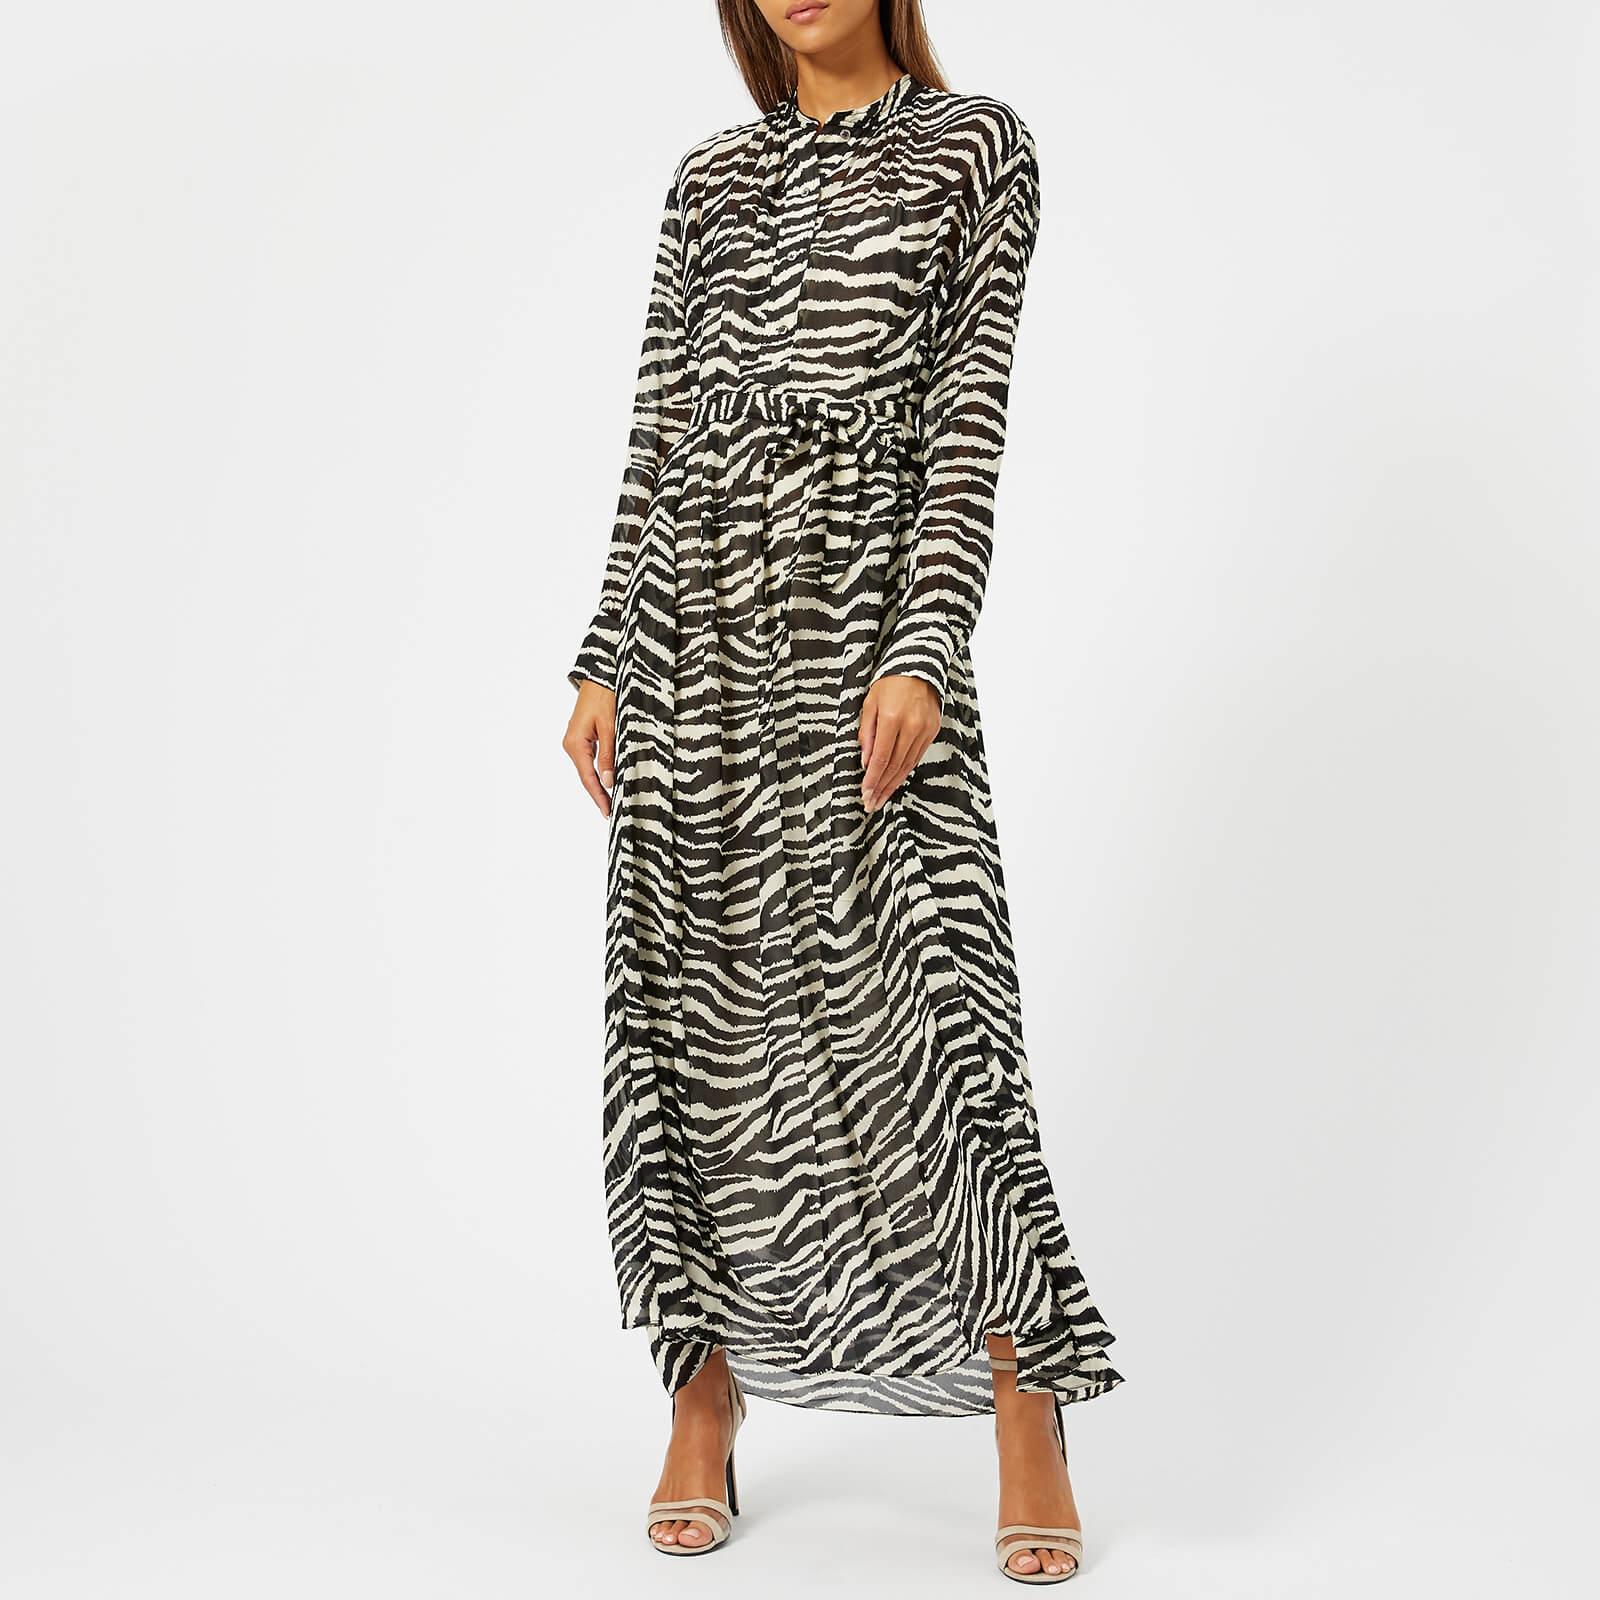 b8ba98f4b7 Isabel Marant Étoile Women's Joly Rock N Roll Dress - Ecru - Free UK  Delivery over £50